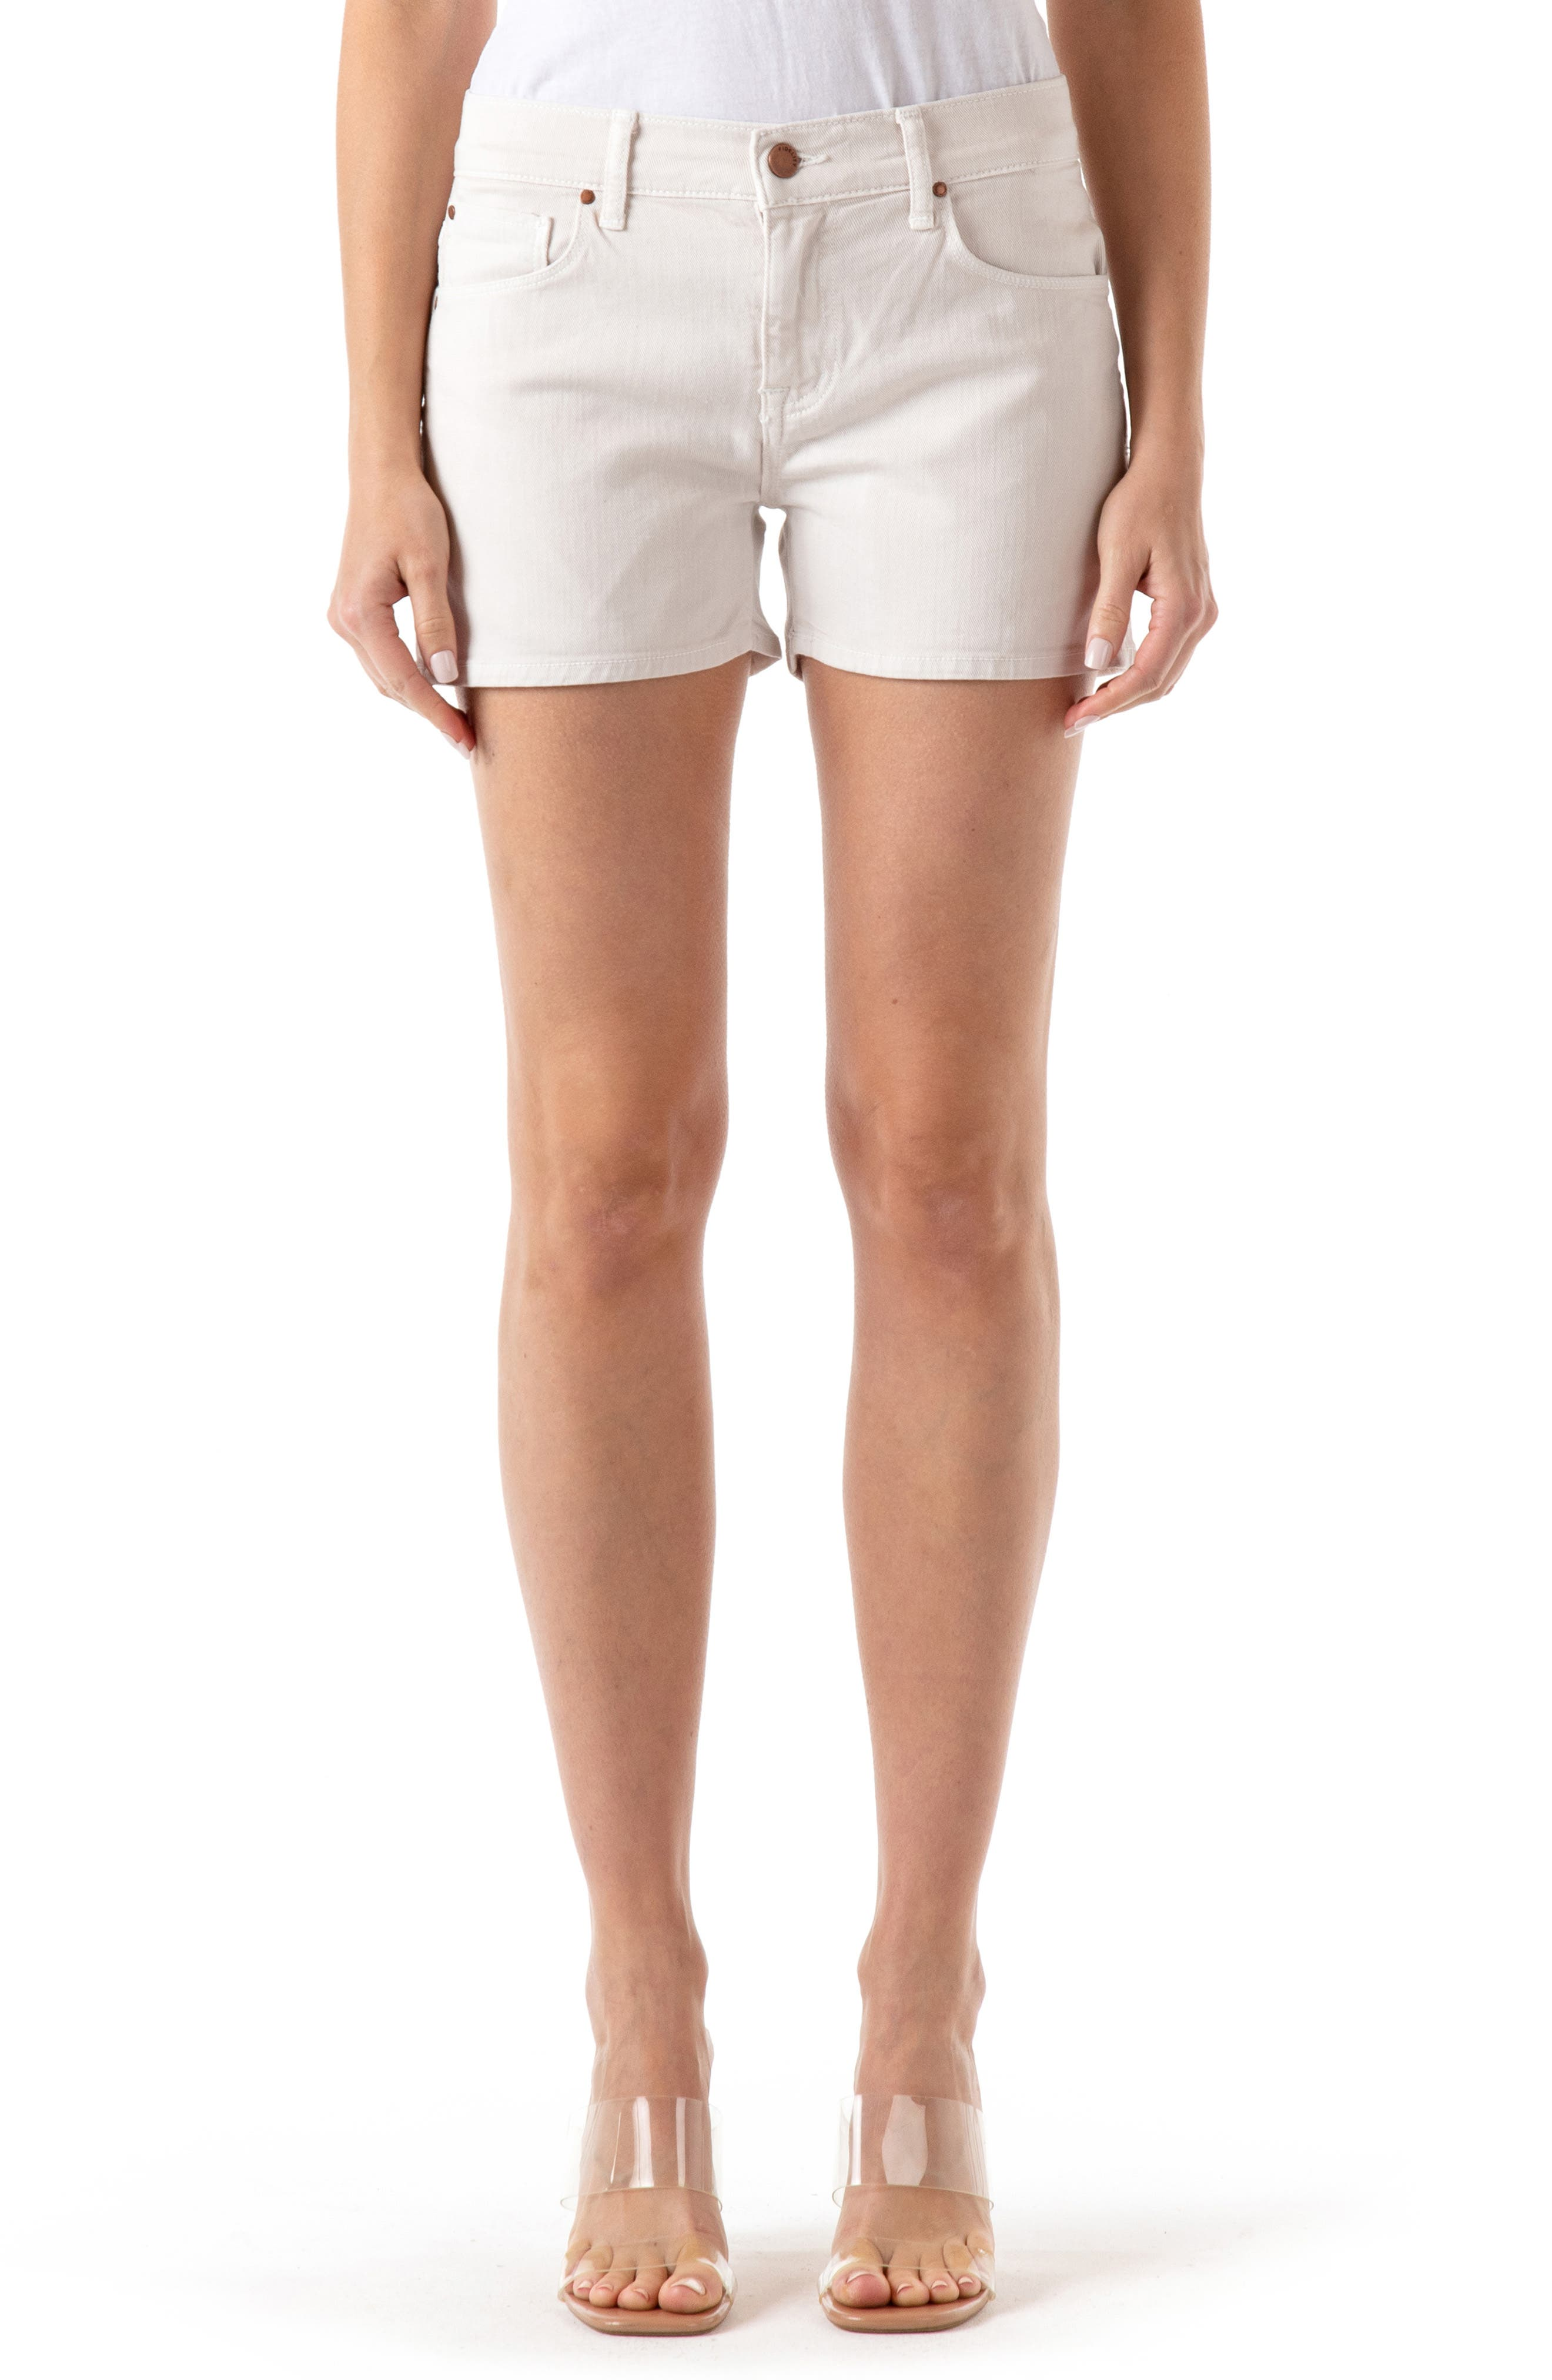 Women's Fidelity Malibu High Waist Denim Shorts